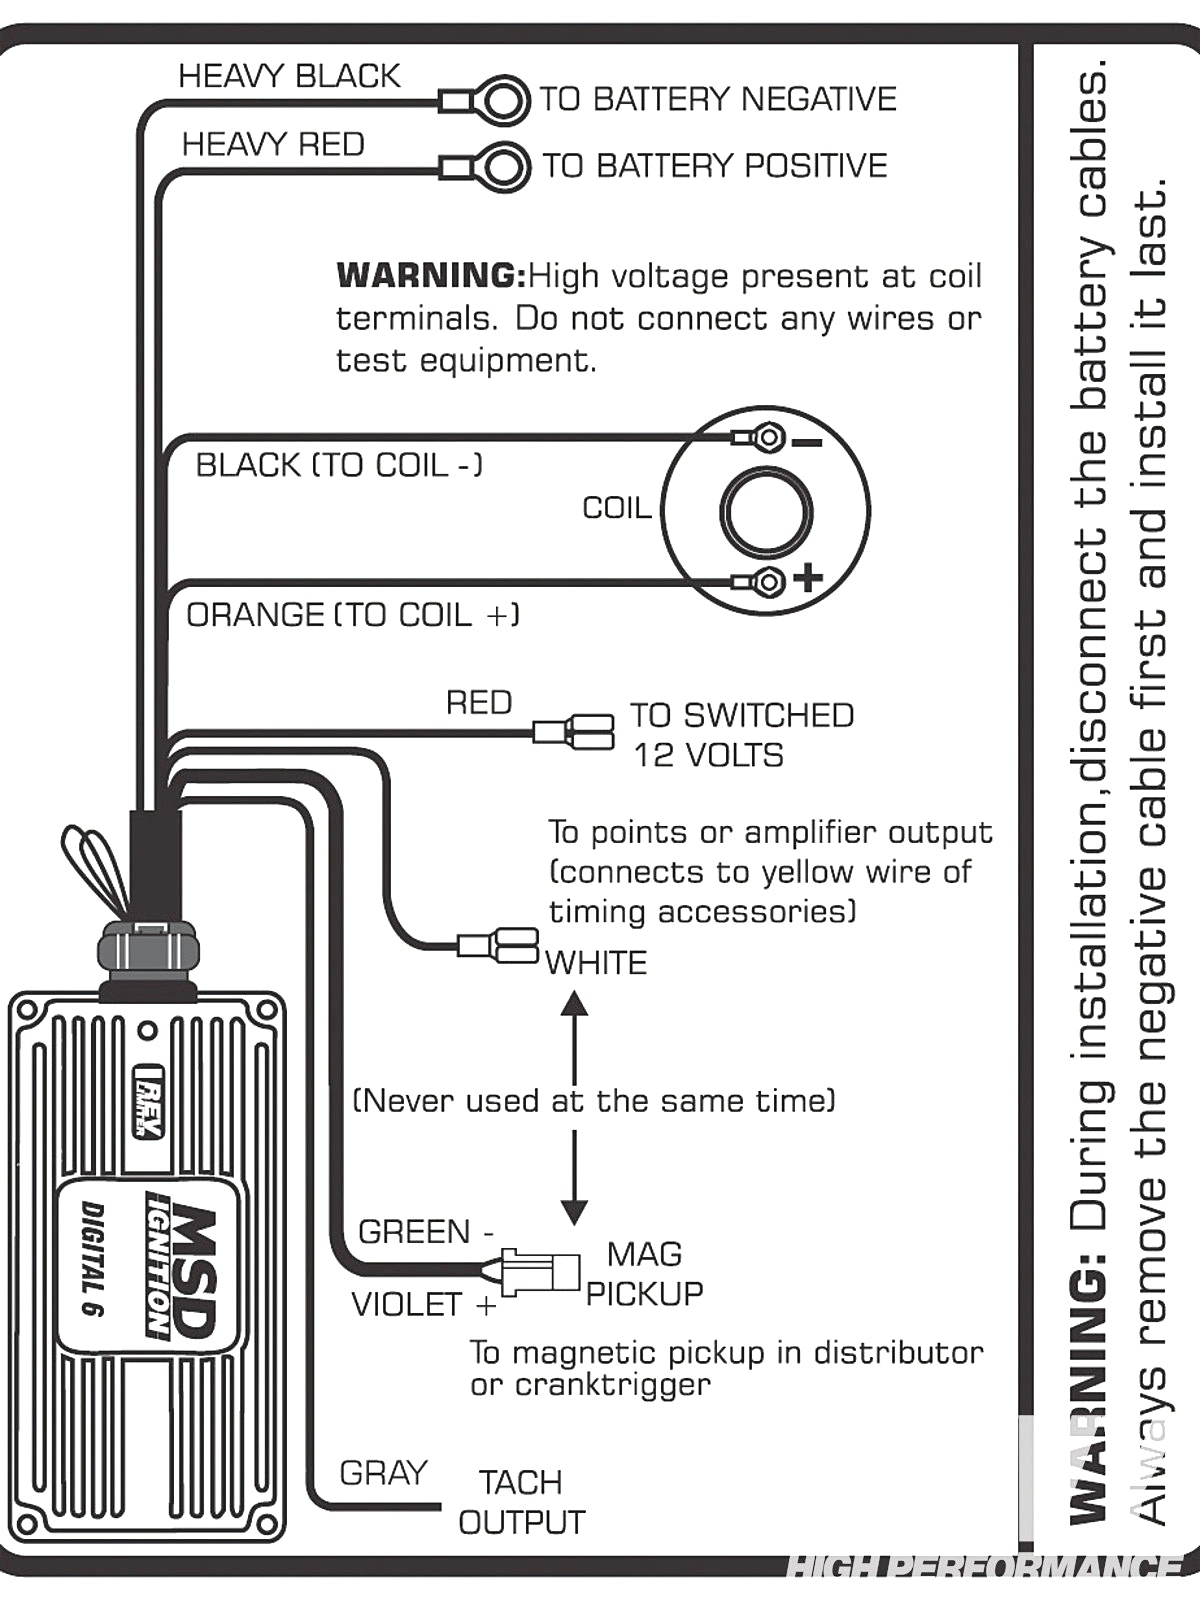 Edelbrock Msd 6al Wiring Diagram - Wiring Liry Diagram A4 on msd 6al wiring diagram for tach, chevy 305 distributor diagram, msd gm hei wiring, chevy distributor cap diagram,